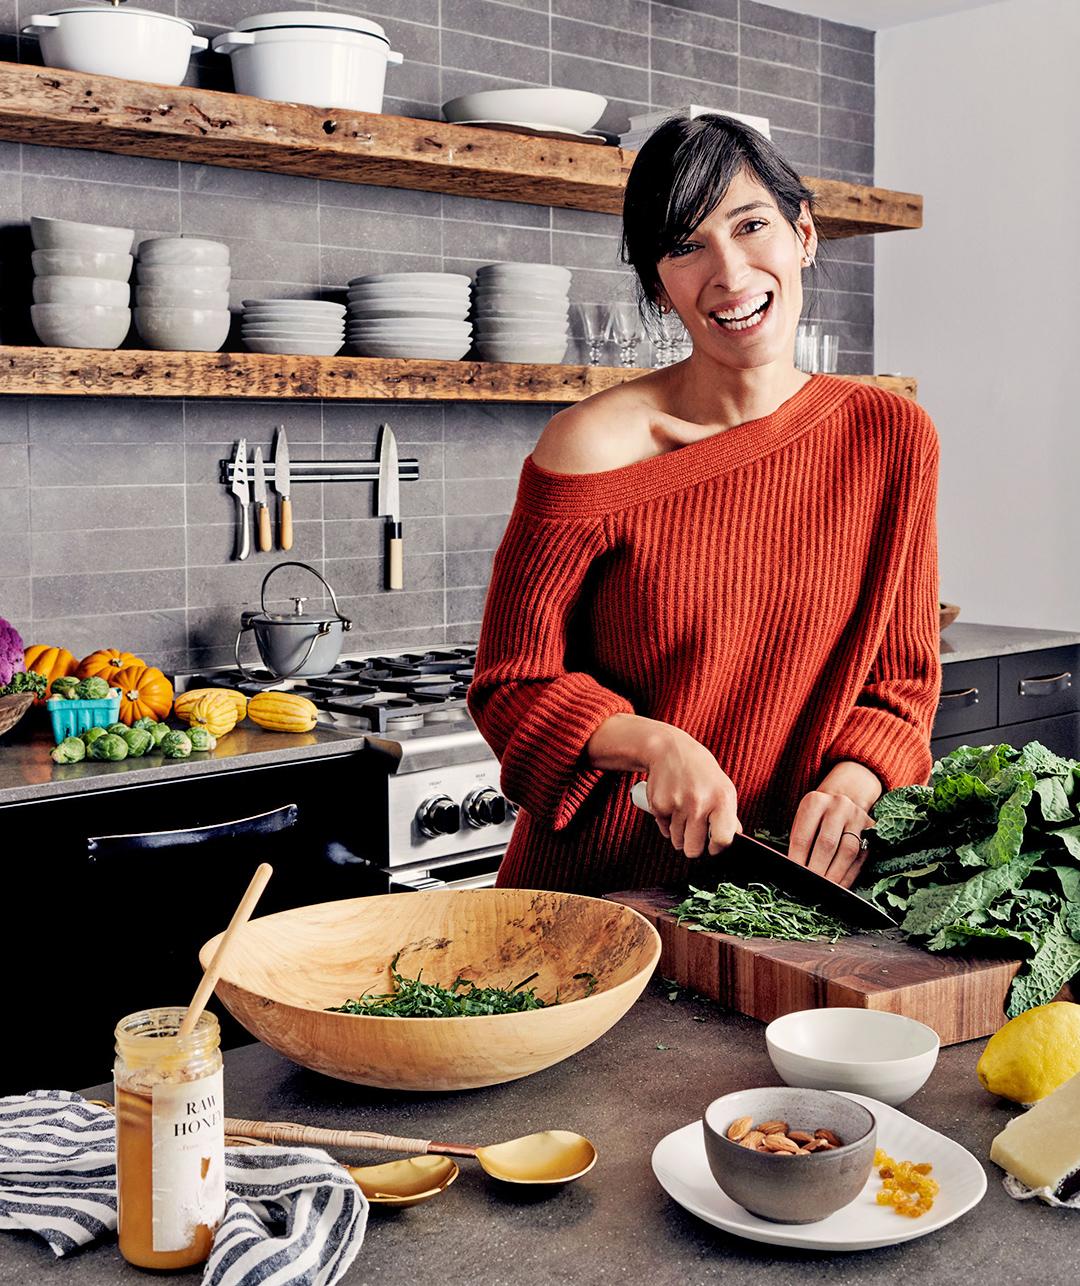 athena in kitchen cutting vegetables